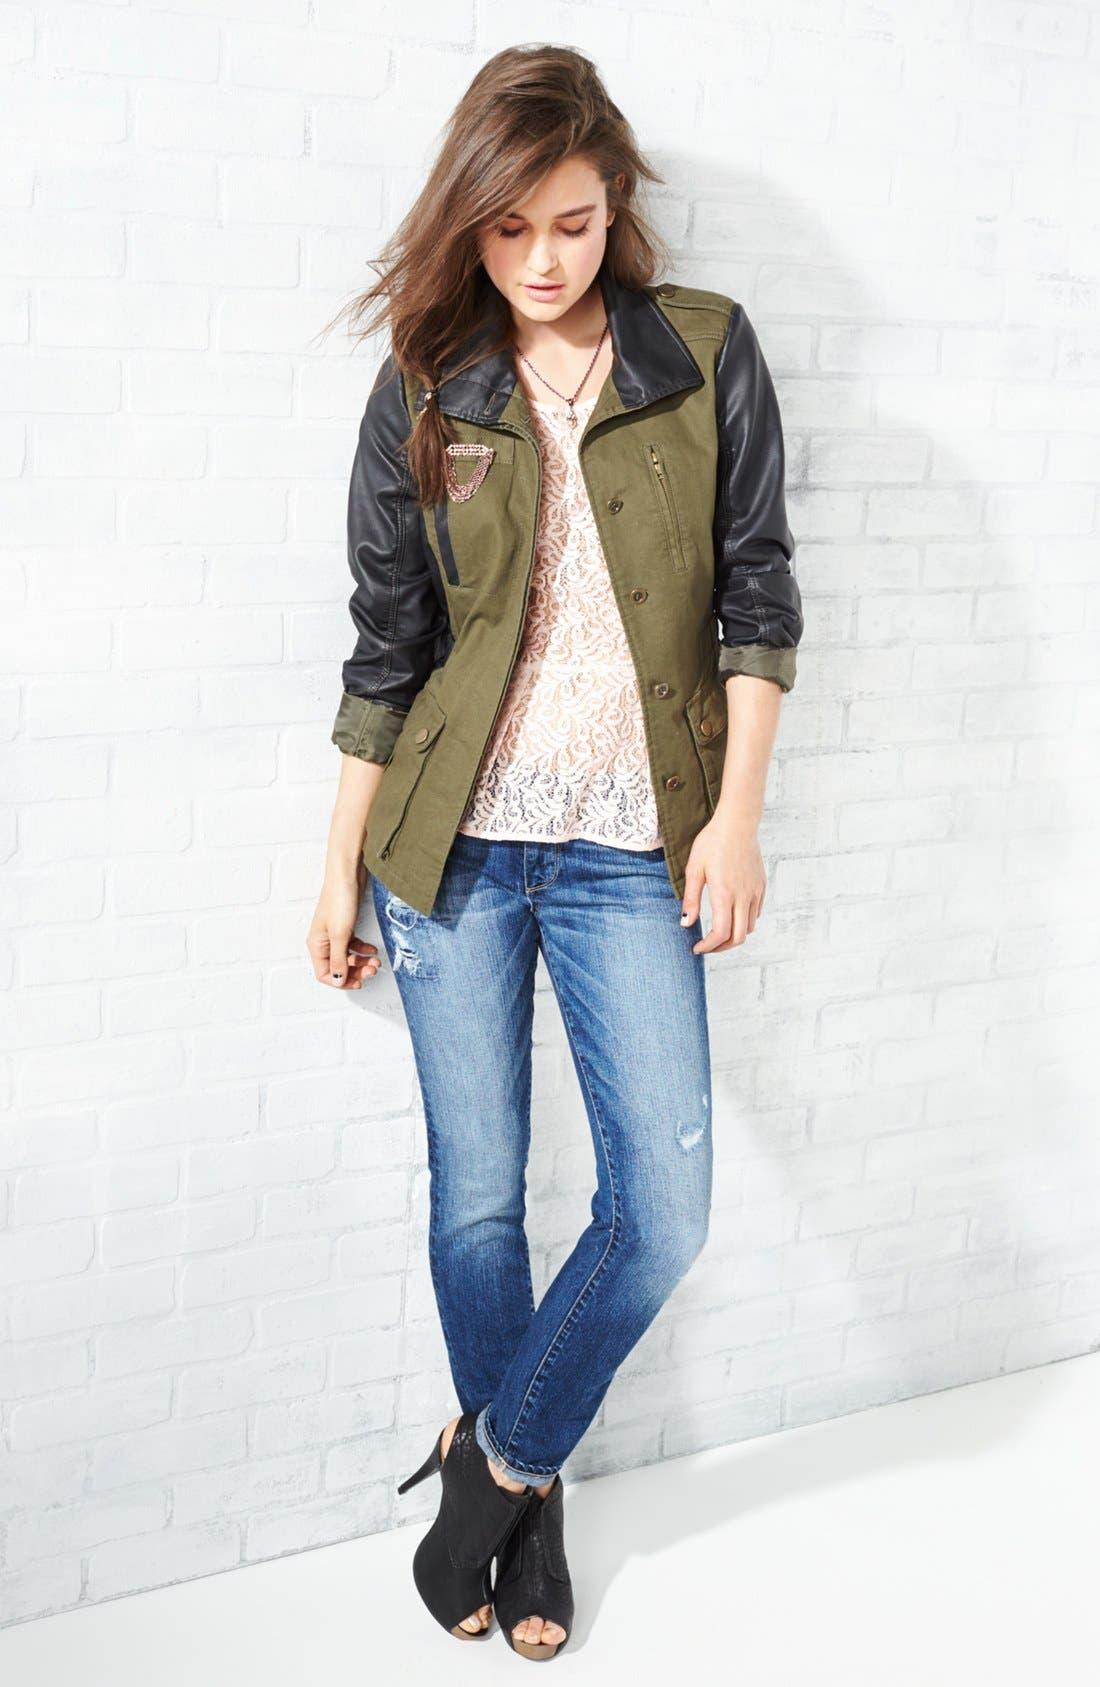 Alternate Image 1 Selected - Bernardo Cotton & Faux Leather Anorak Jacket (Regular & Petite)